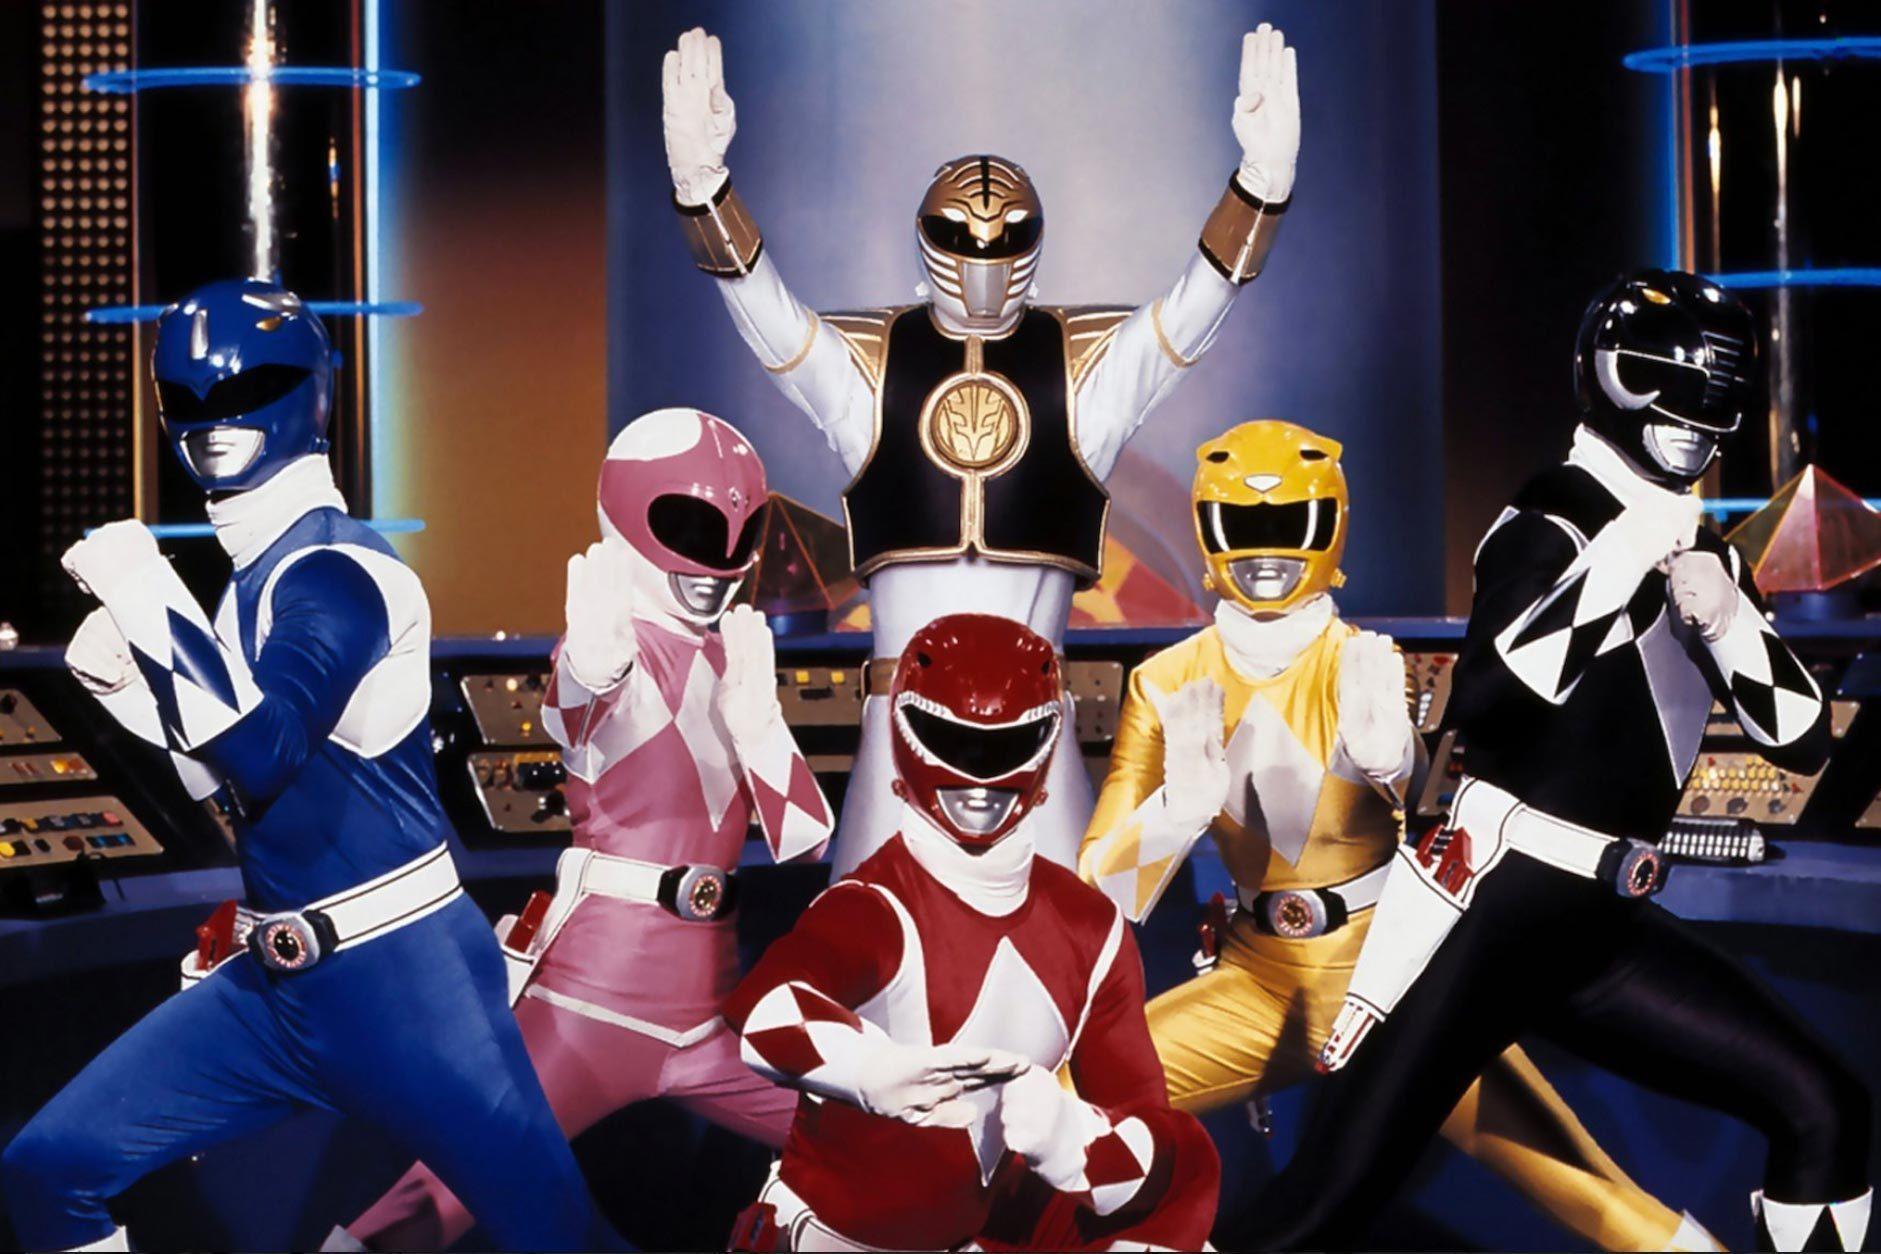 Mighty Morphin Power Rangers (4 seasons)